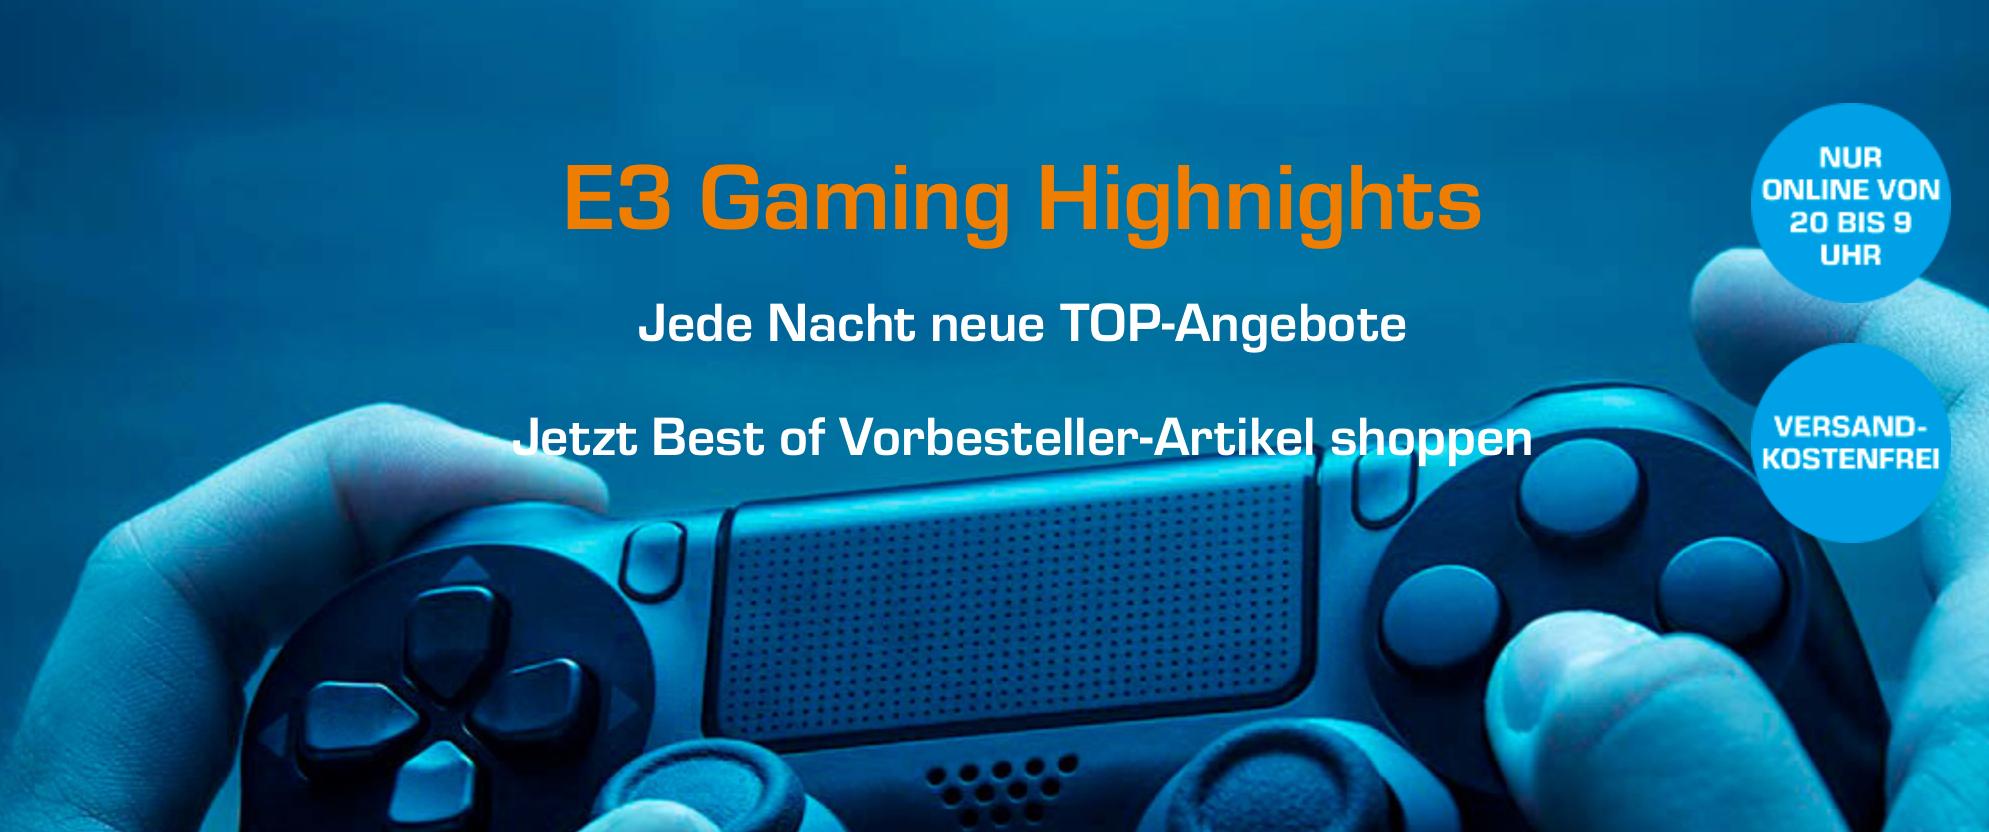 Saturn E3 Gaming Highnights (z.B. Jurassic World Evolution oder Crackdown 3 für je 49,99 EUR, Shenmue I & II für 29,99 EUR)